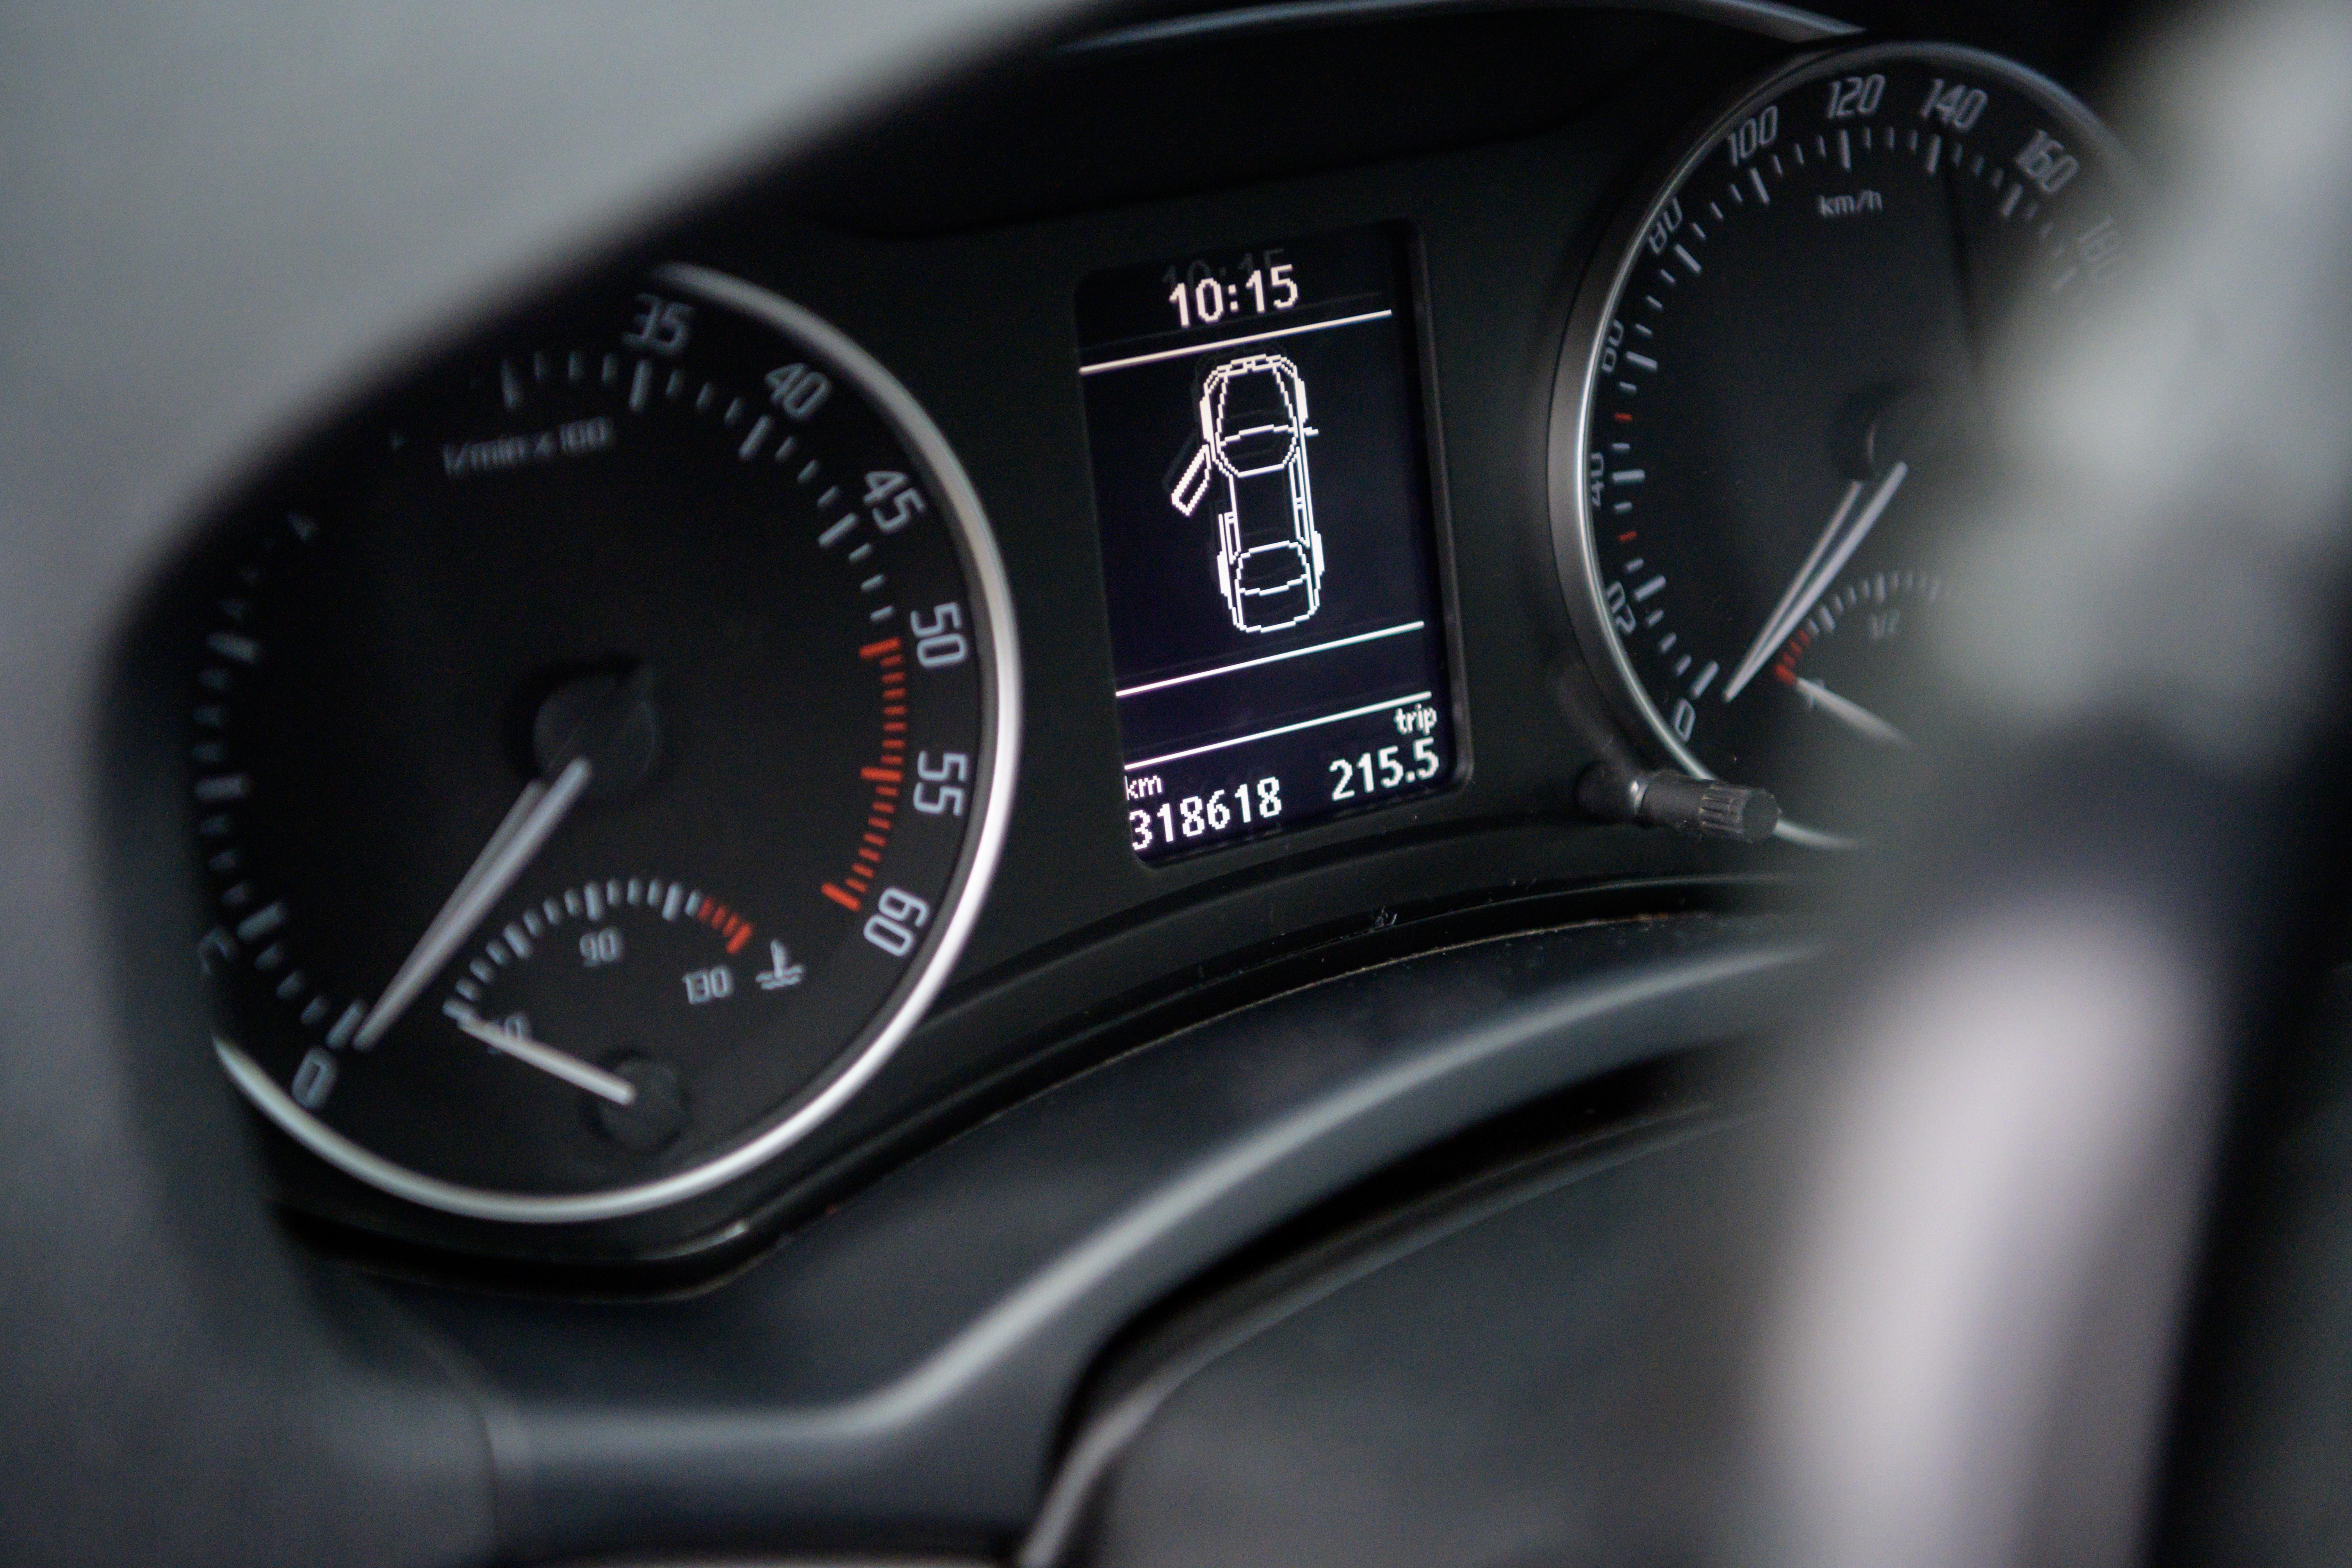 skoda-octavia-interior-dashboard-signage